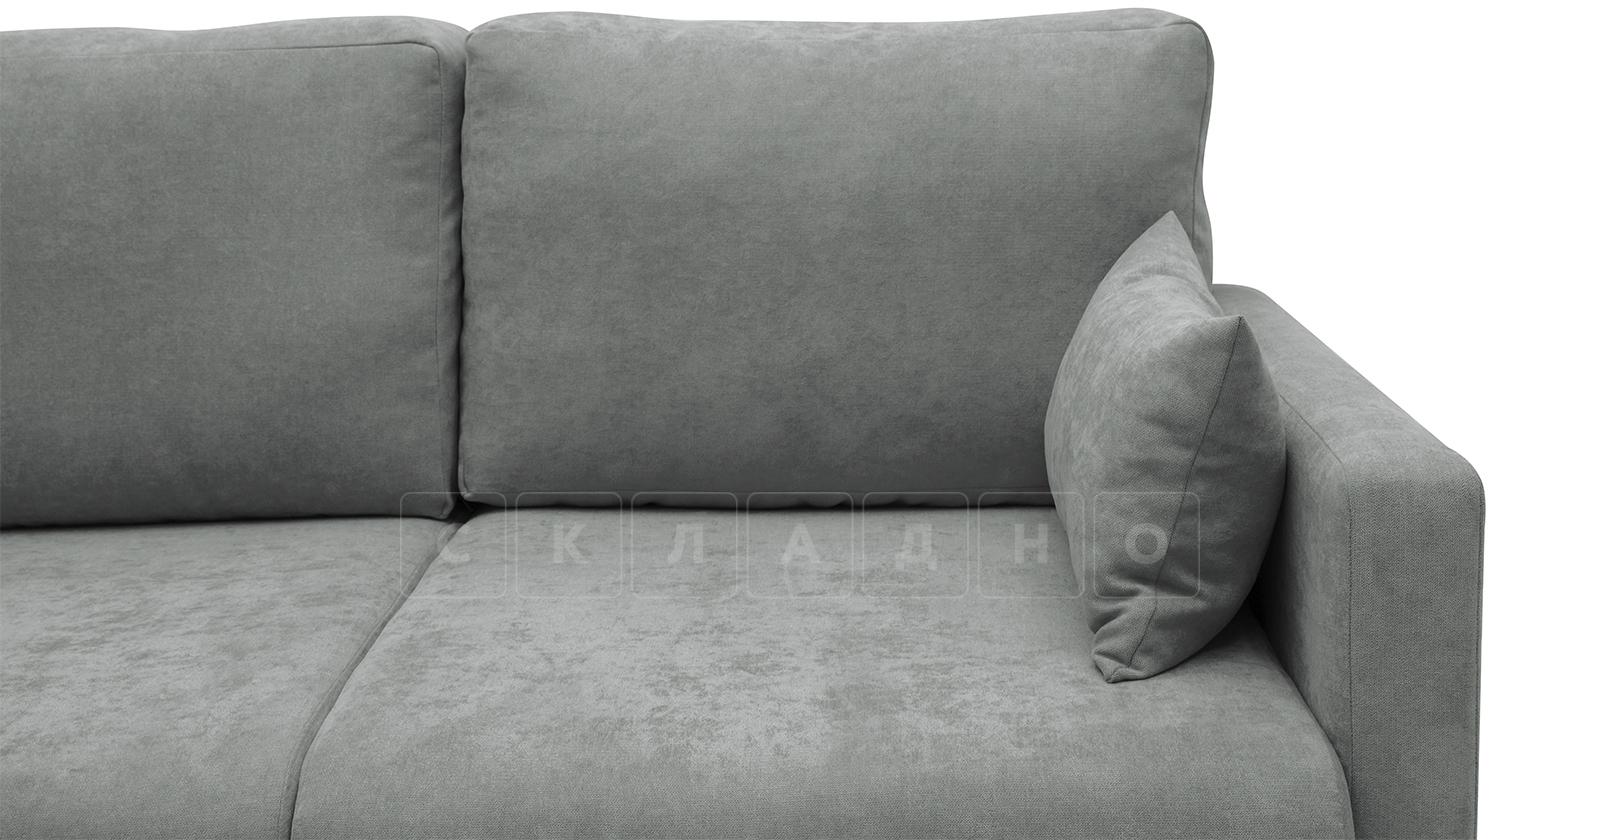 Угловой диван Дарвин серый фото 10 | интернет-магазин Складно